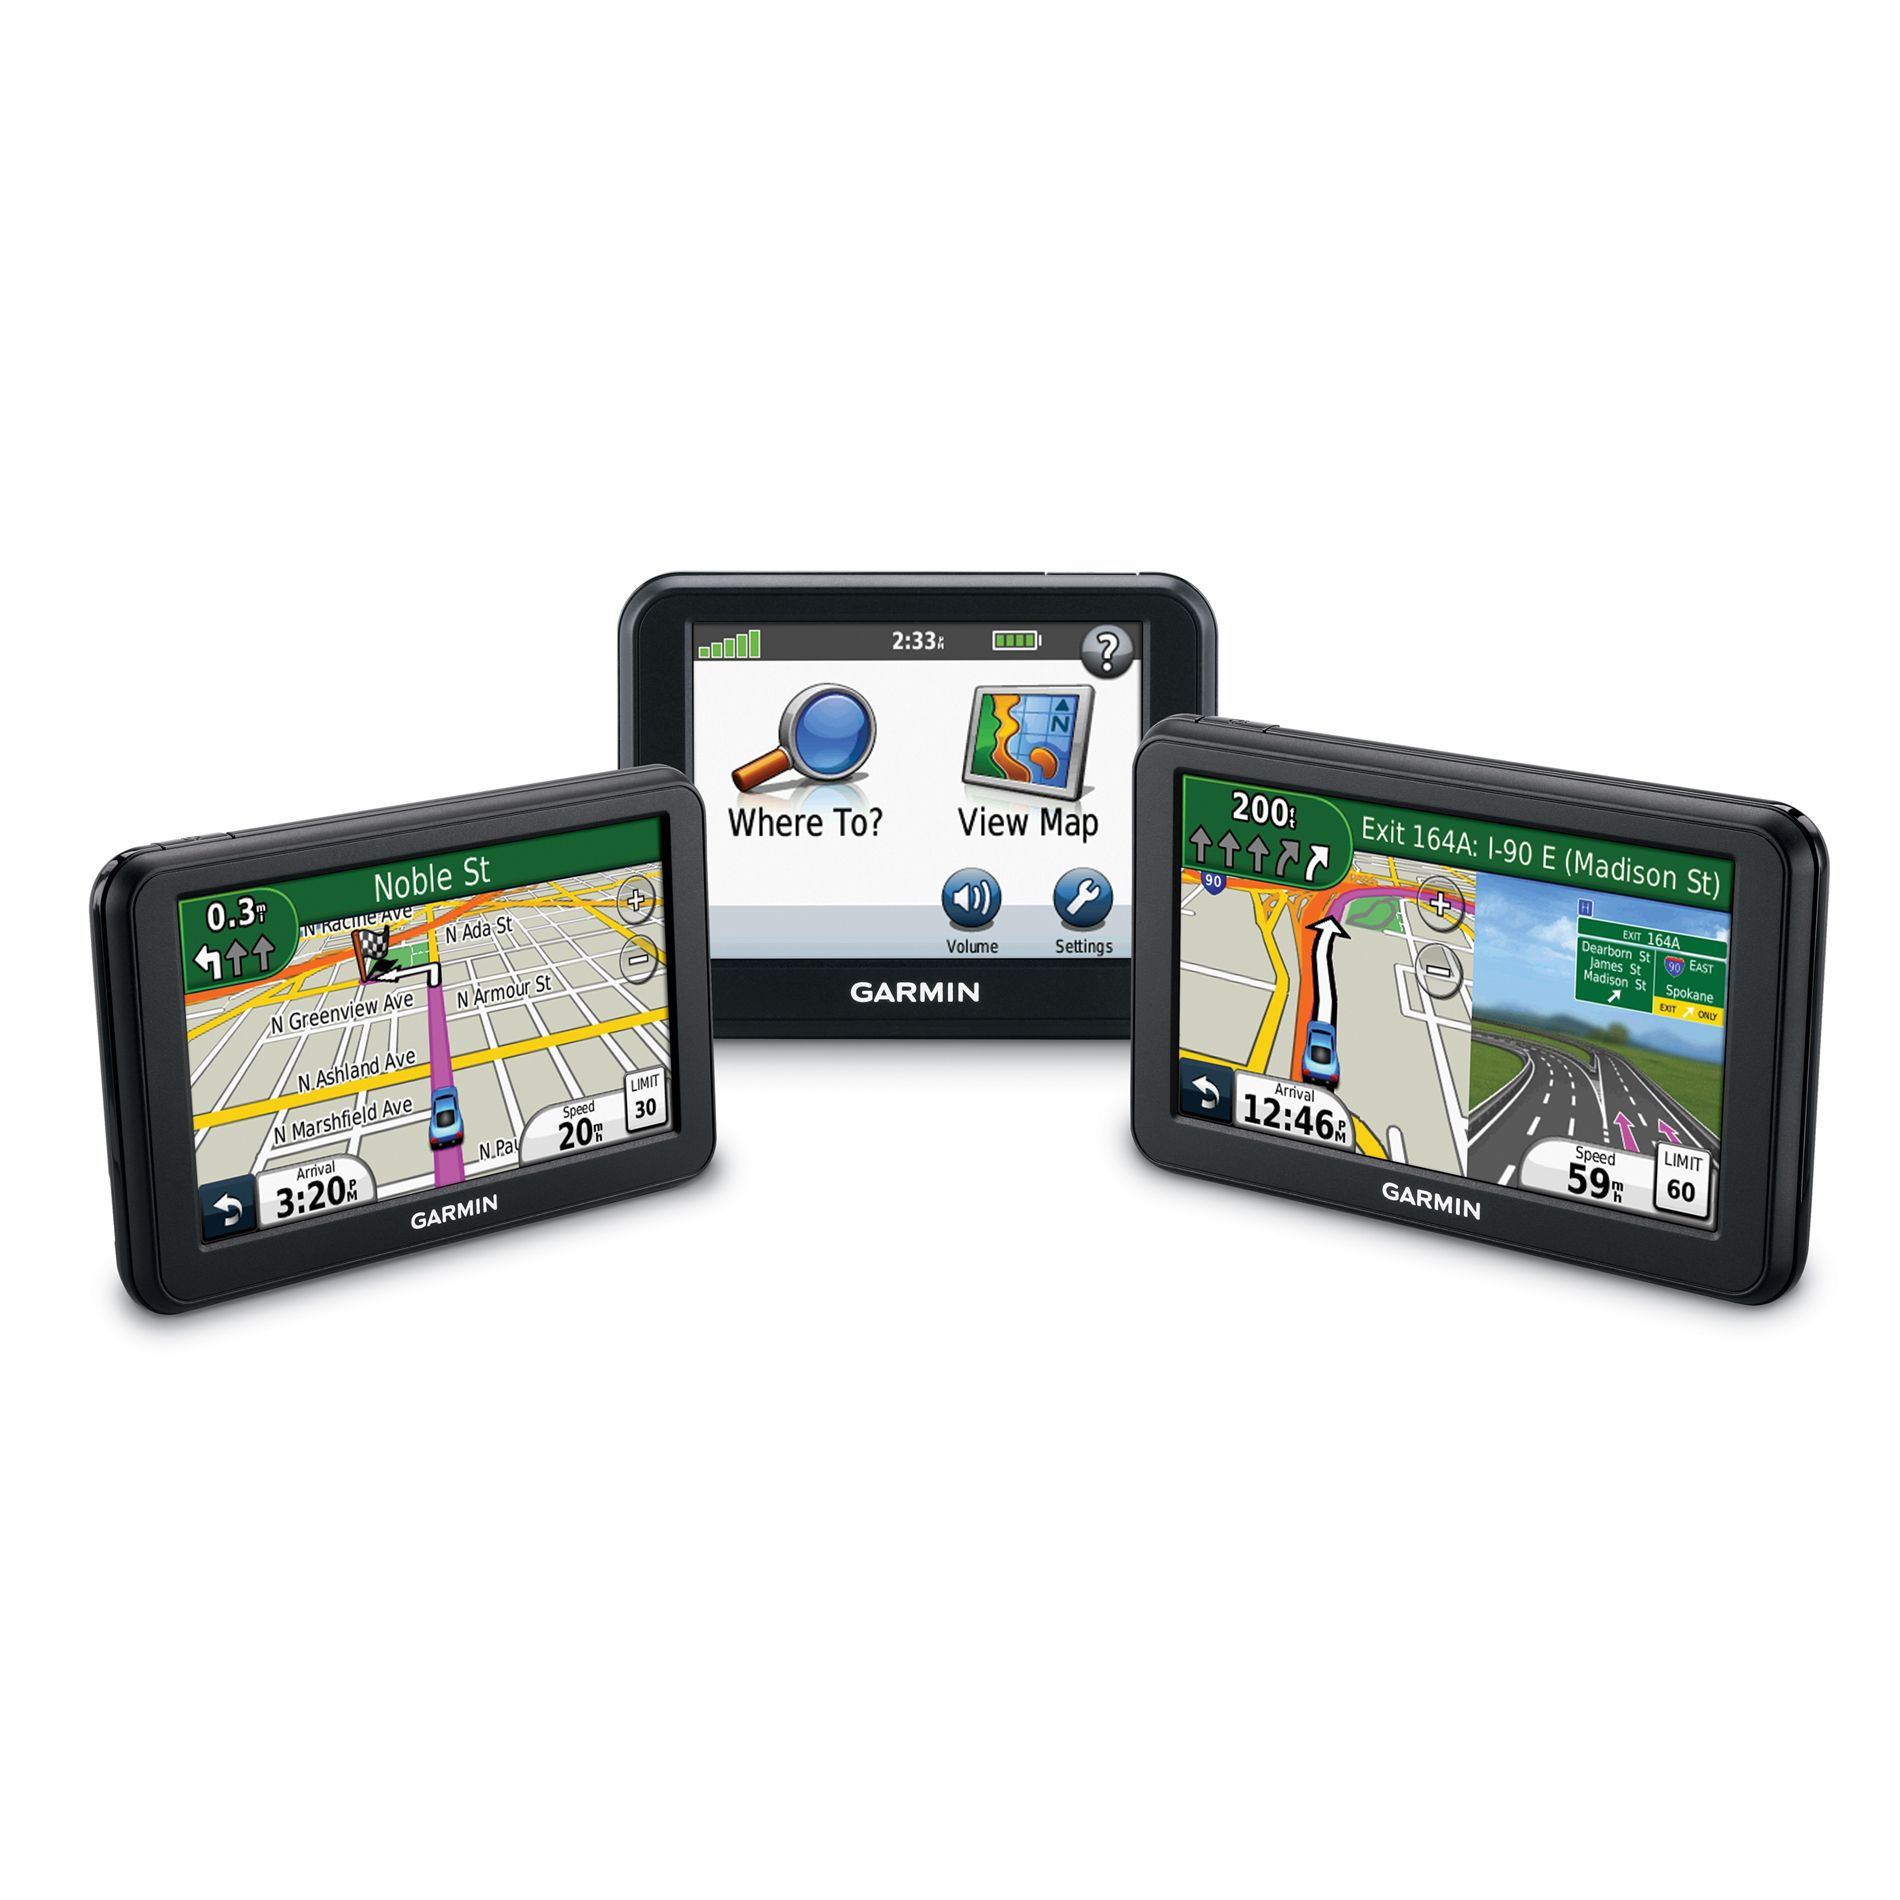 "Garmin nüvi® 50LM 5"" touchscreen with FREE lifetime map updates"